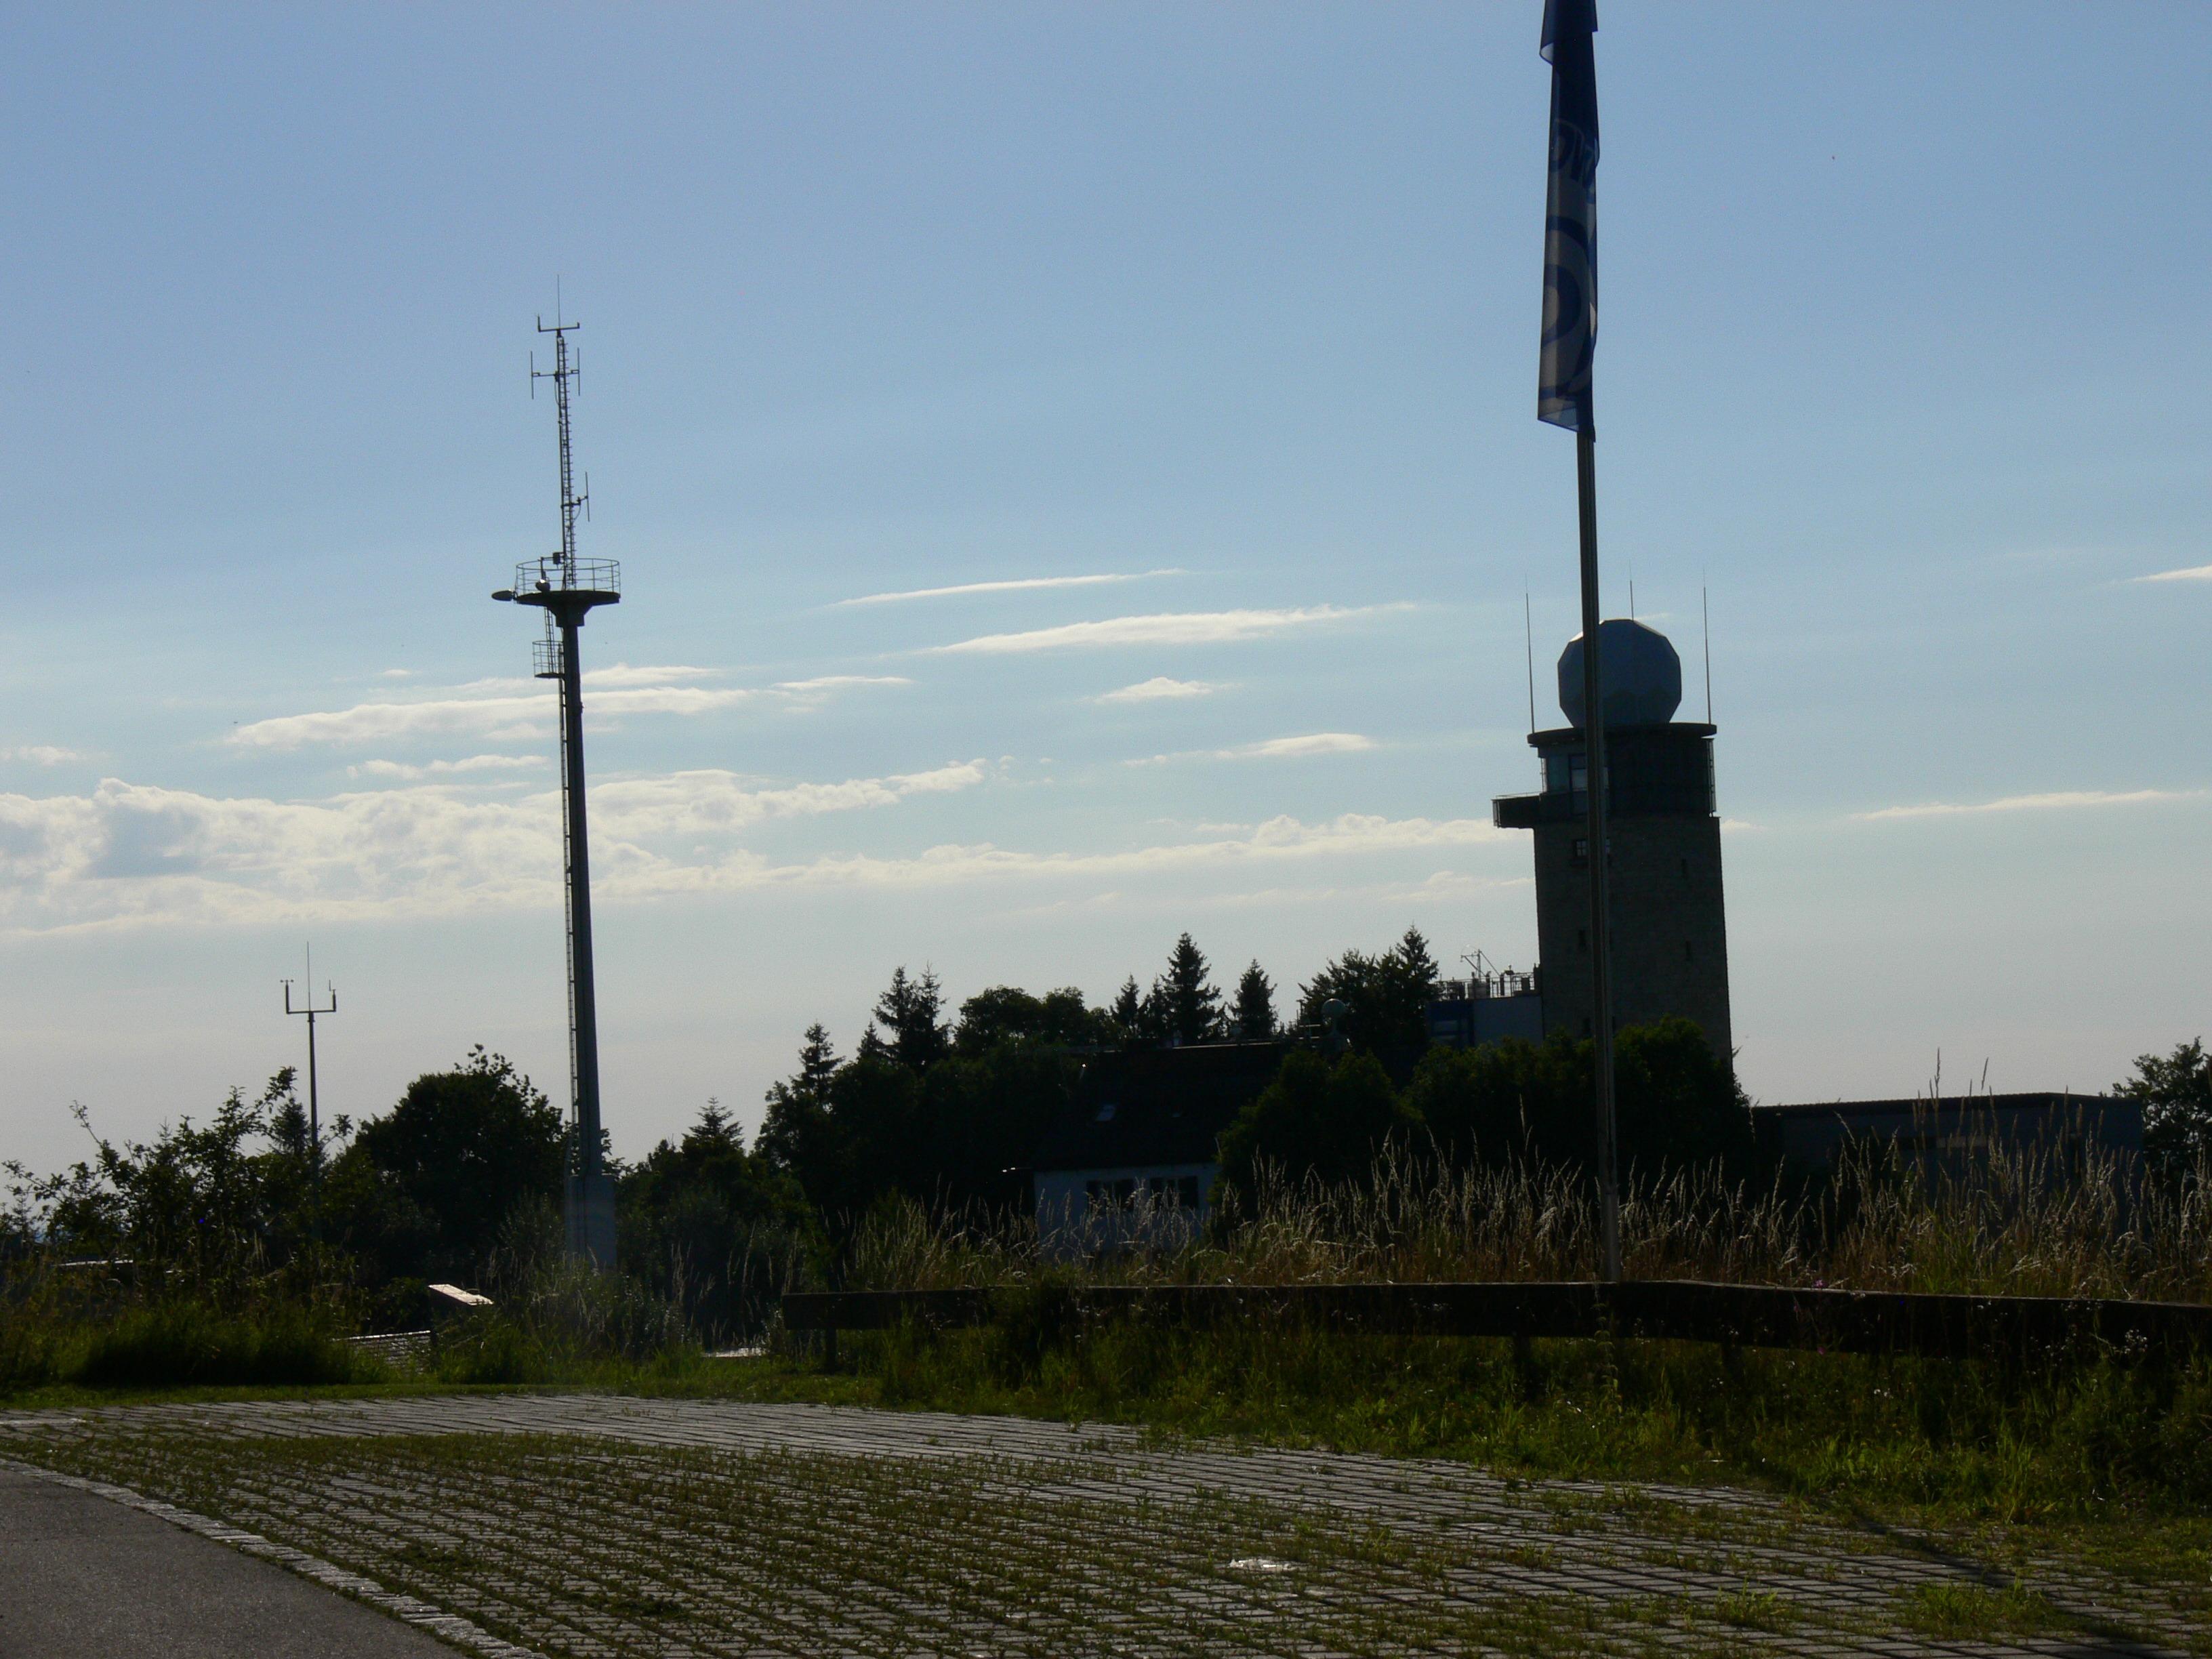 Us Weather Map Barometric Pressure%0A wind tower street light lighting meteorology weather station weather  observation hohenpei enberg